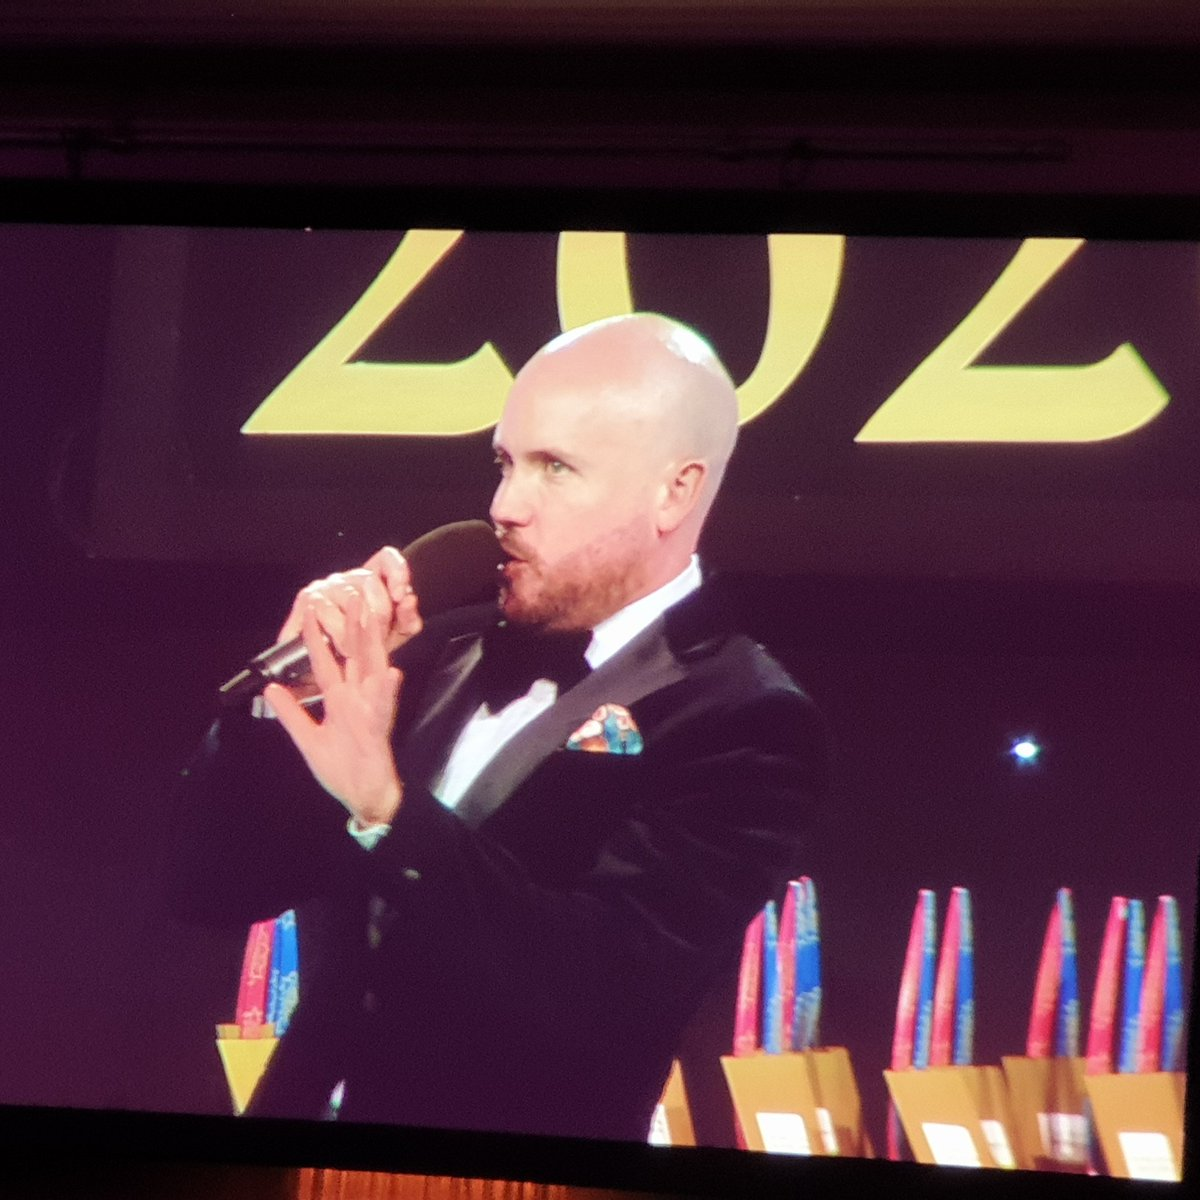 So Tom Allen is the host!!  @VADO_uk #kbb2020 #kbbawards2020 #kbbbirmingham